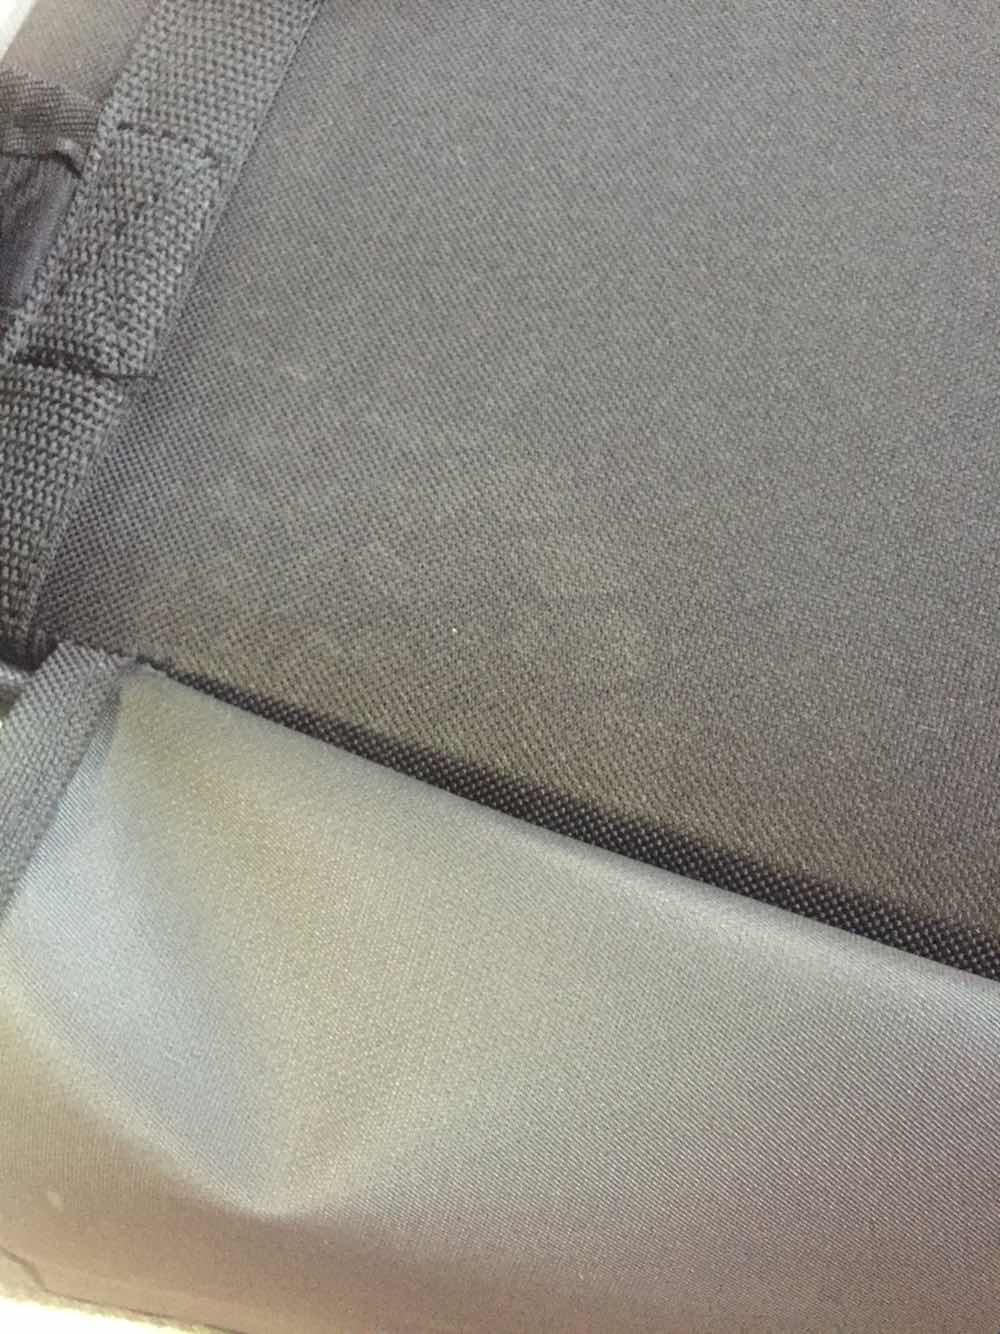 balenciaga latest handbags reviews 00227915 replica